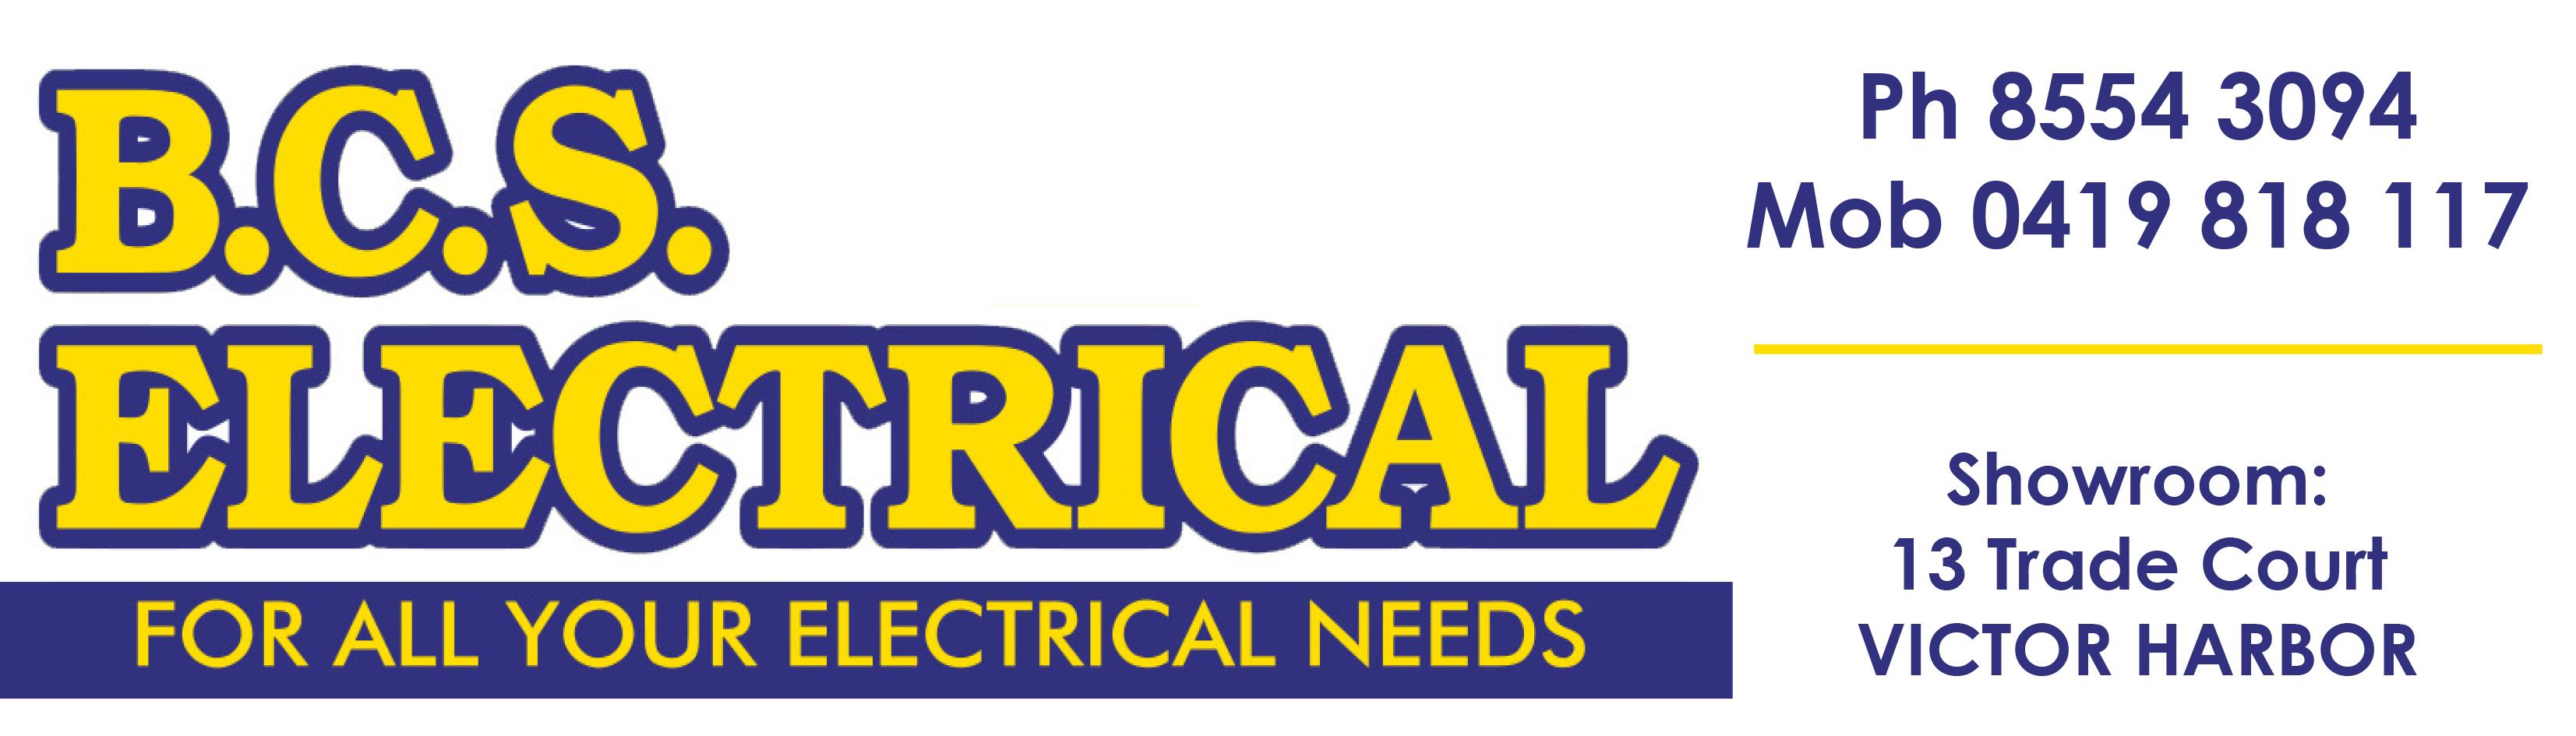 BCS Electrical